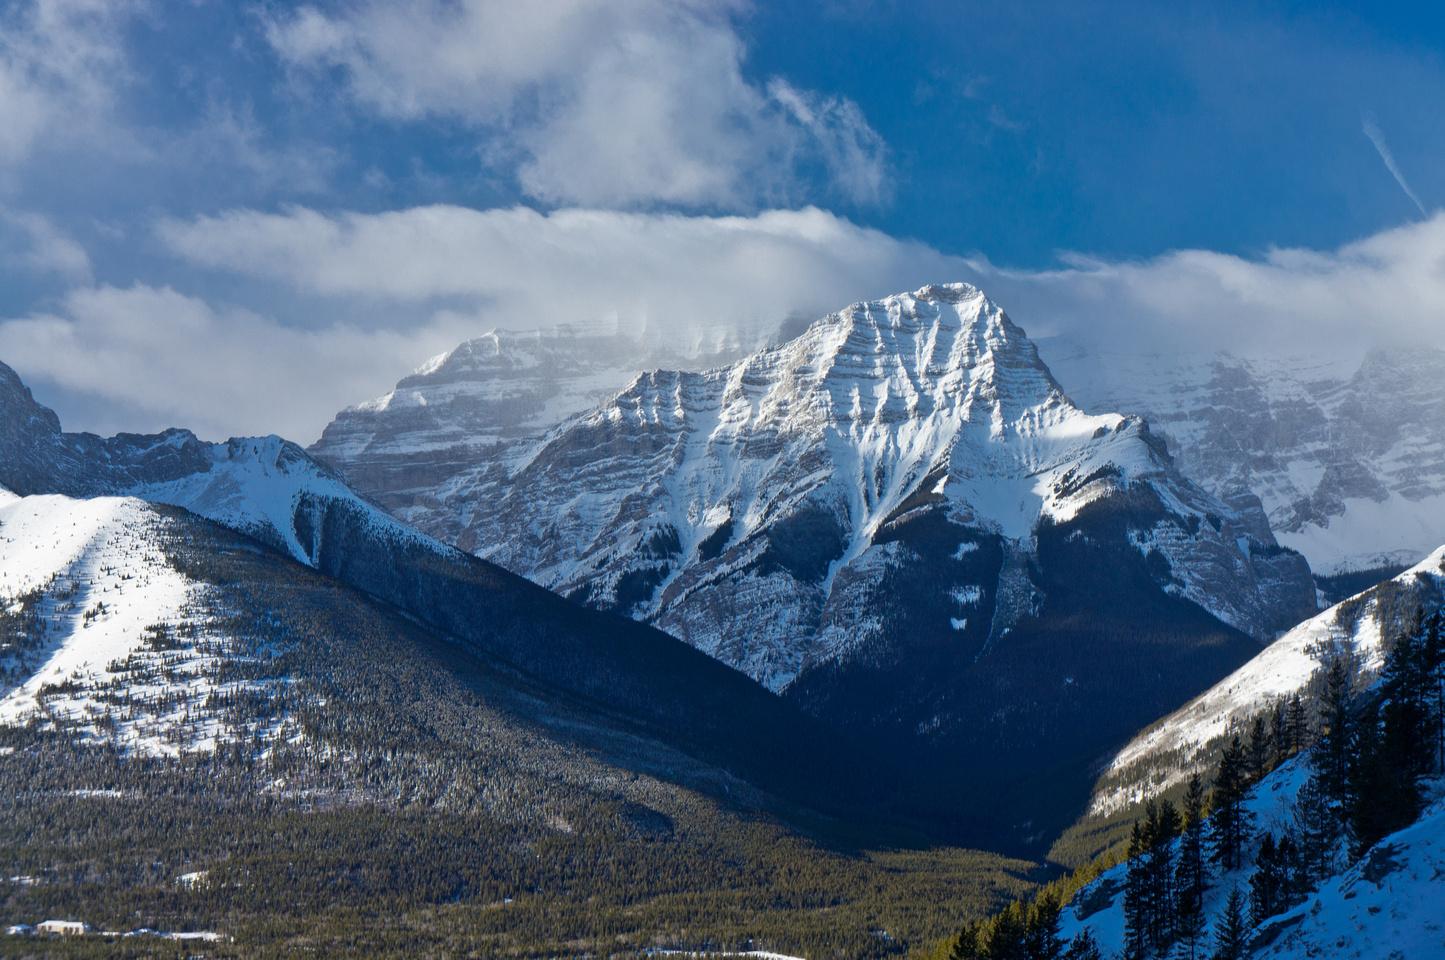 Ribbon Peak is calling my name!